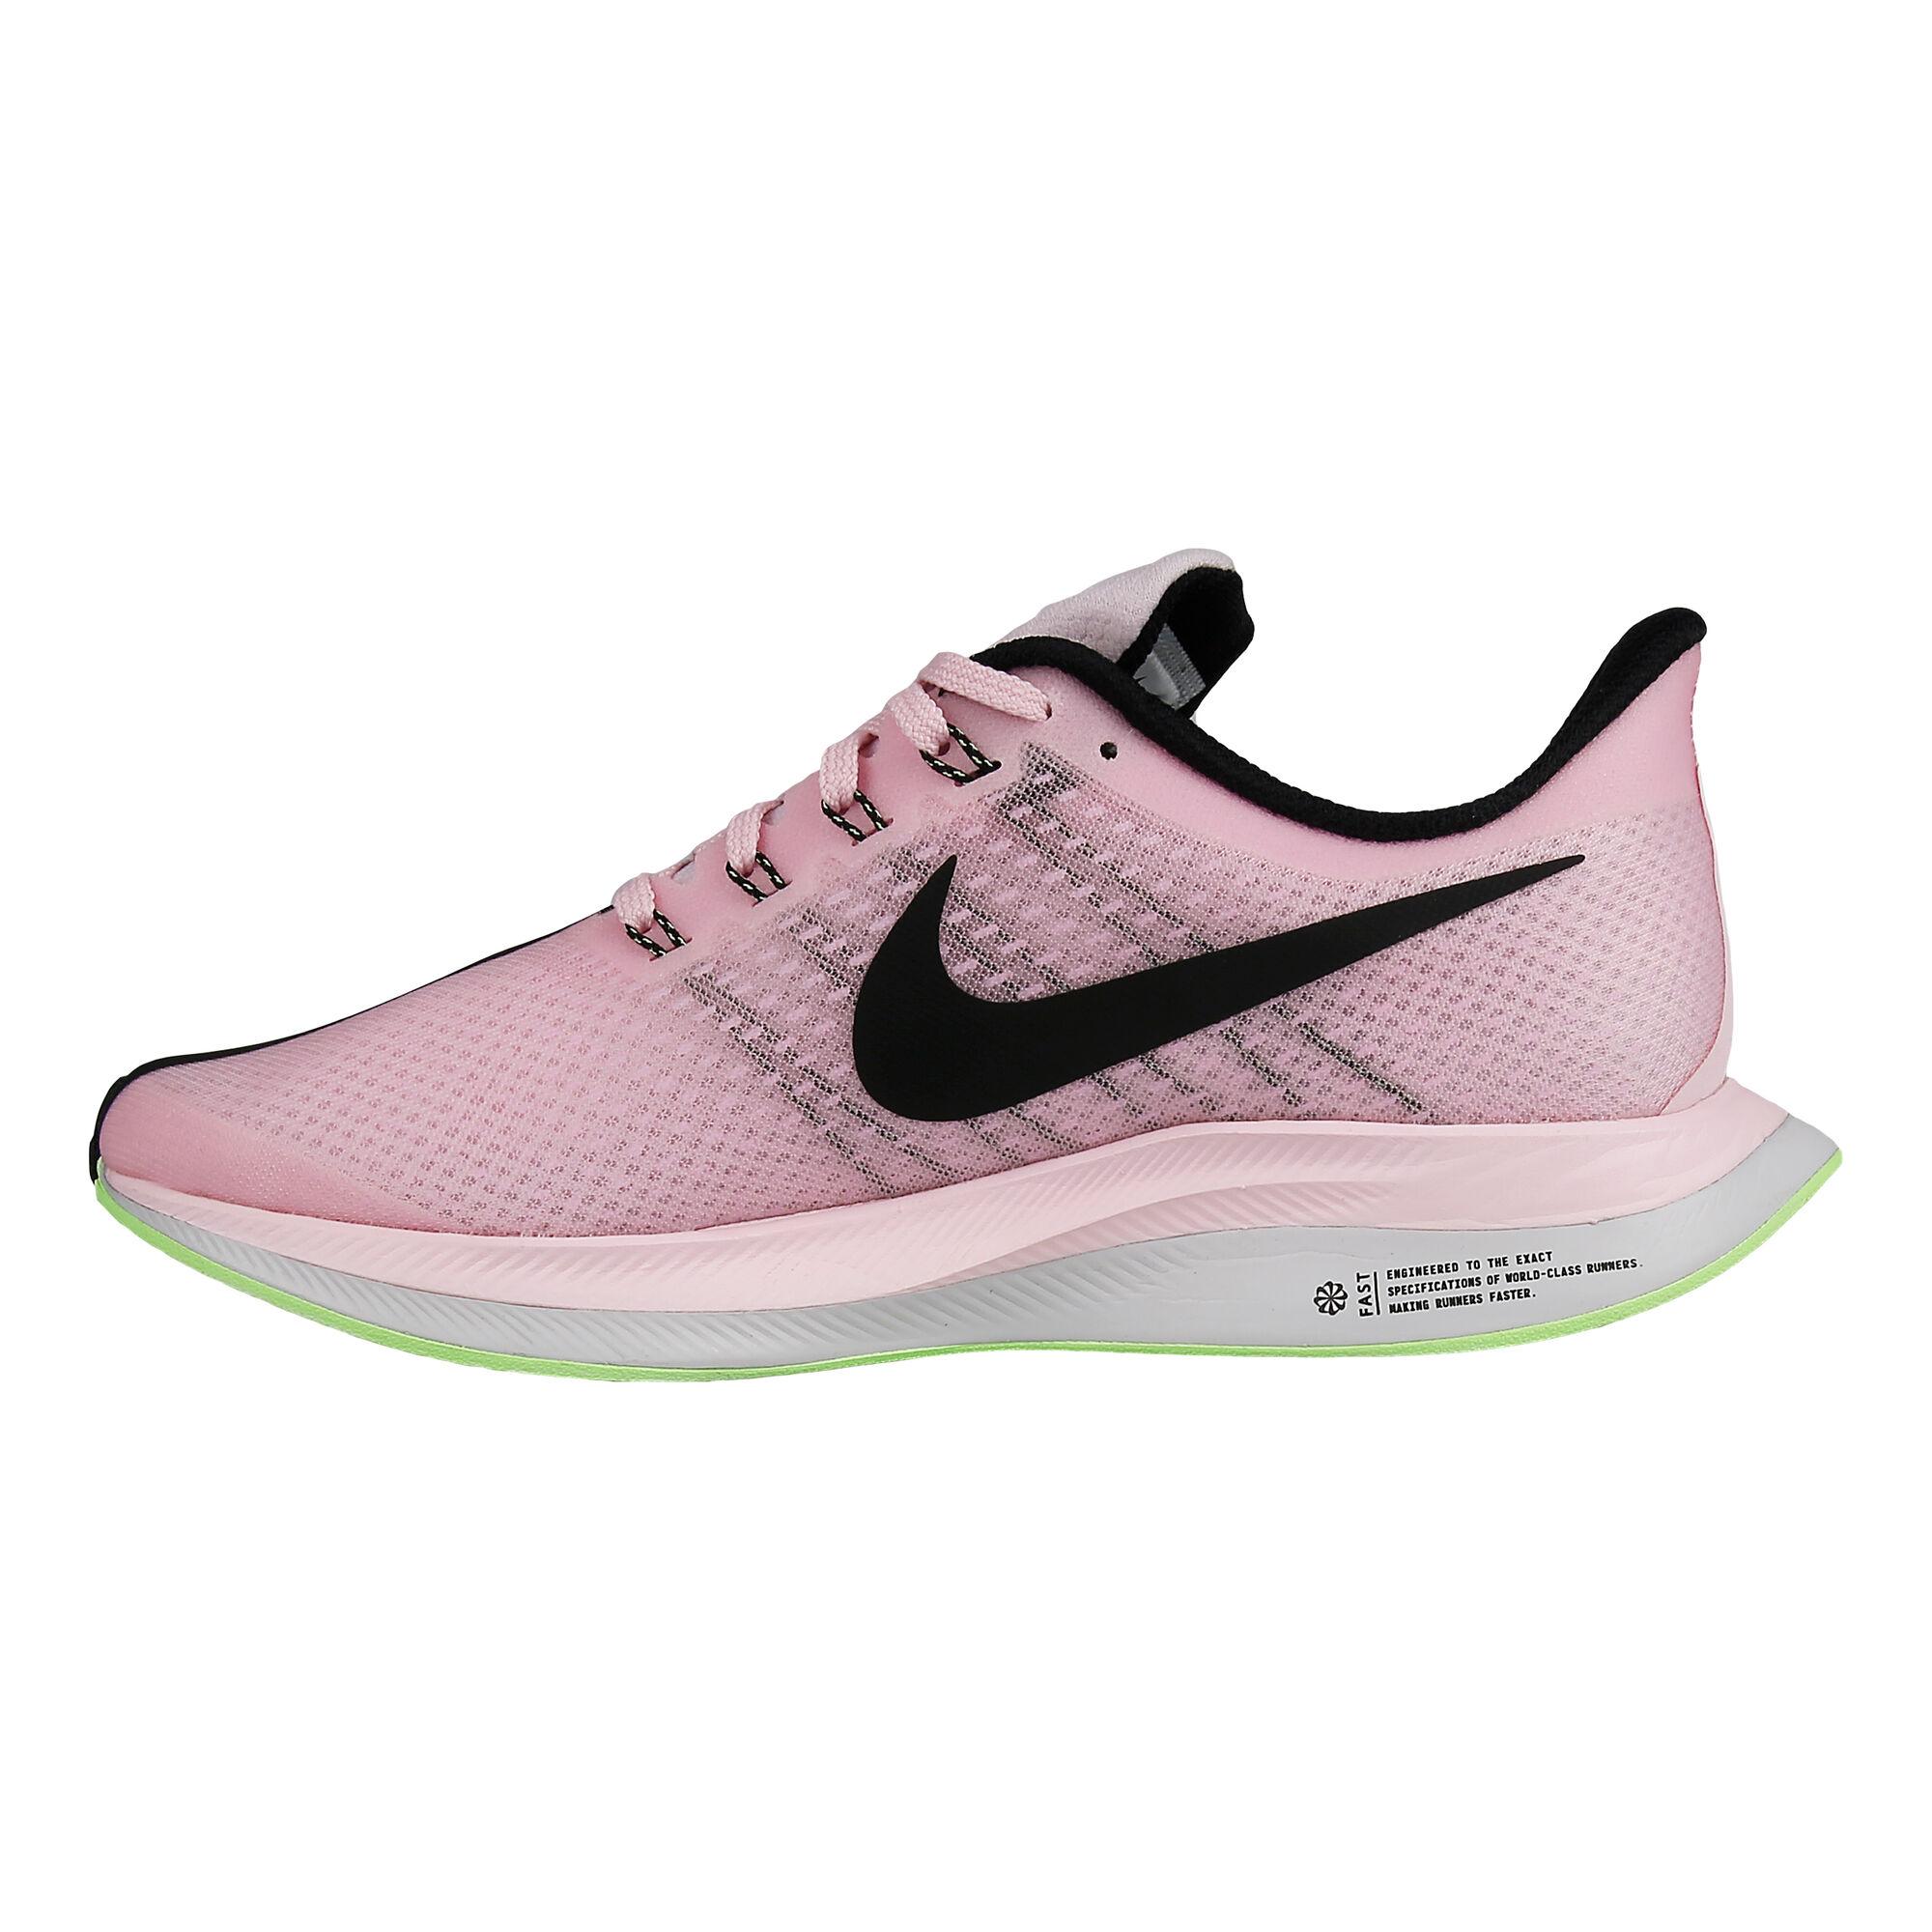 680142e81939 Nike  Nike  Nike  Nike  Nike  Nike  Nike  Nike  Nike. Zoom Pegasus 35 Turbo  Women ...